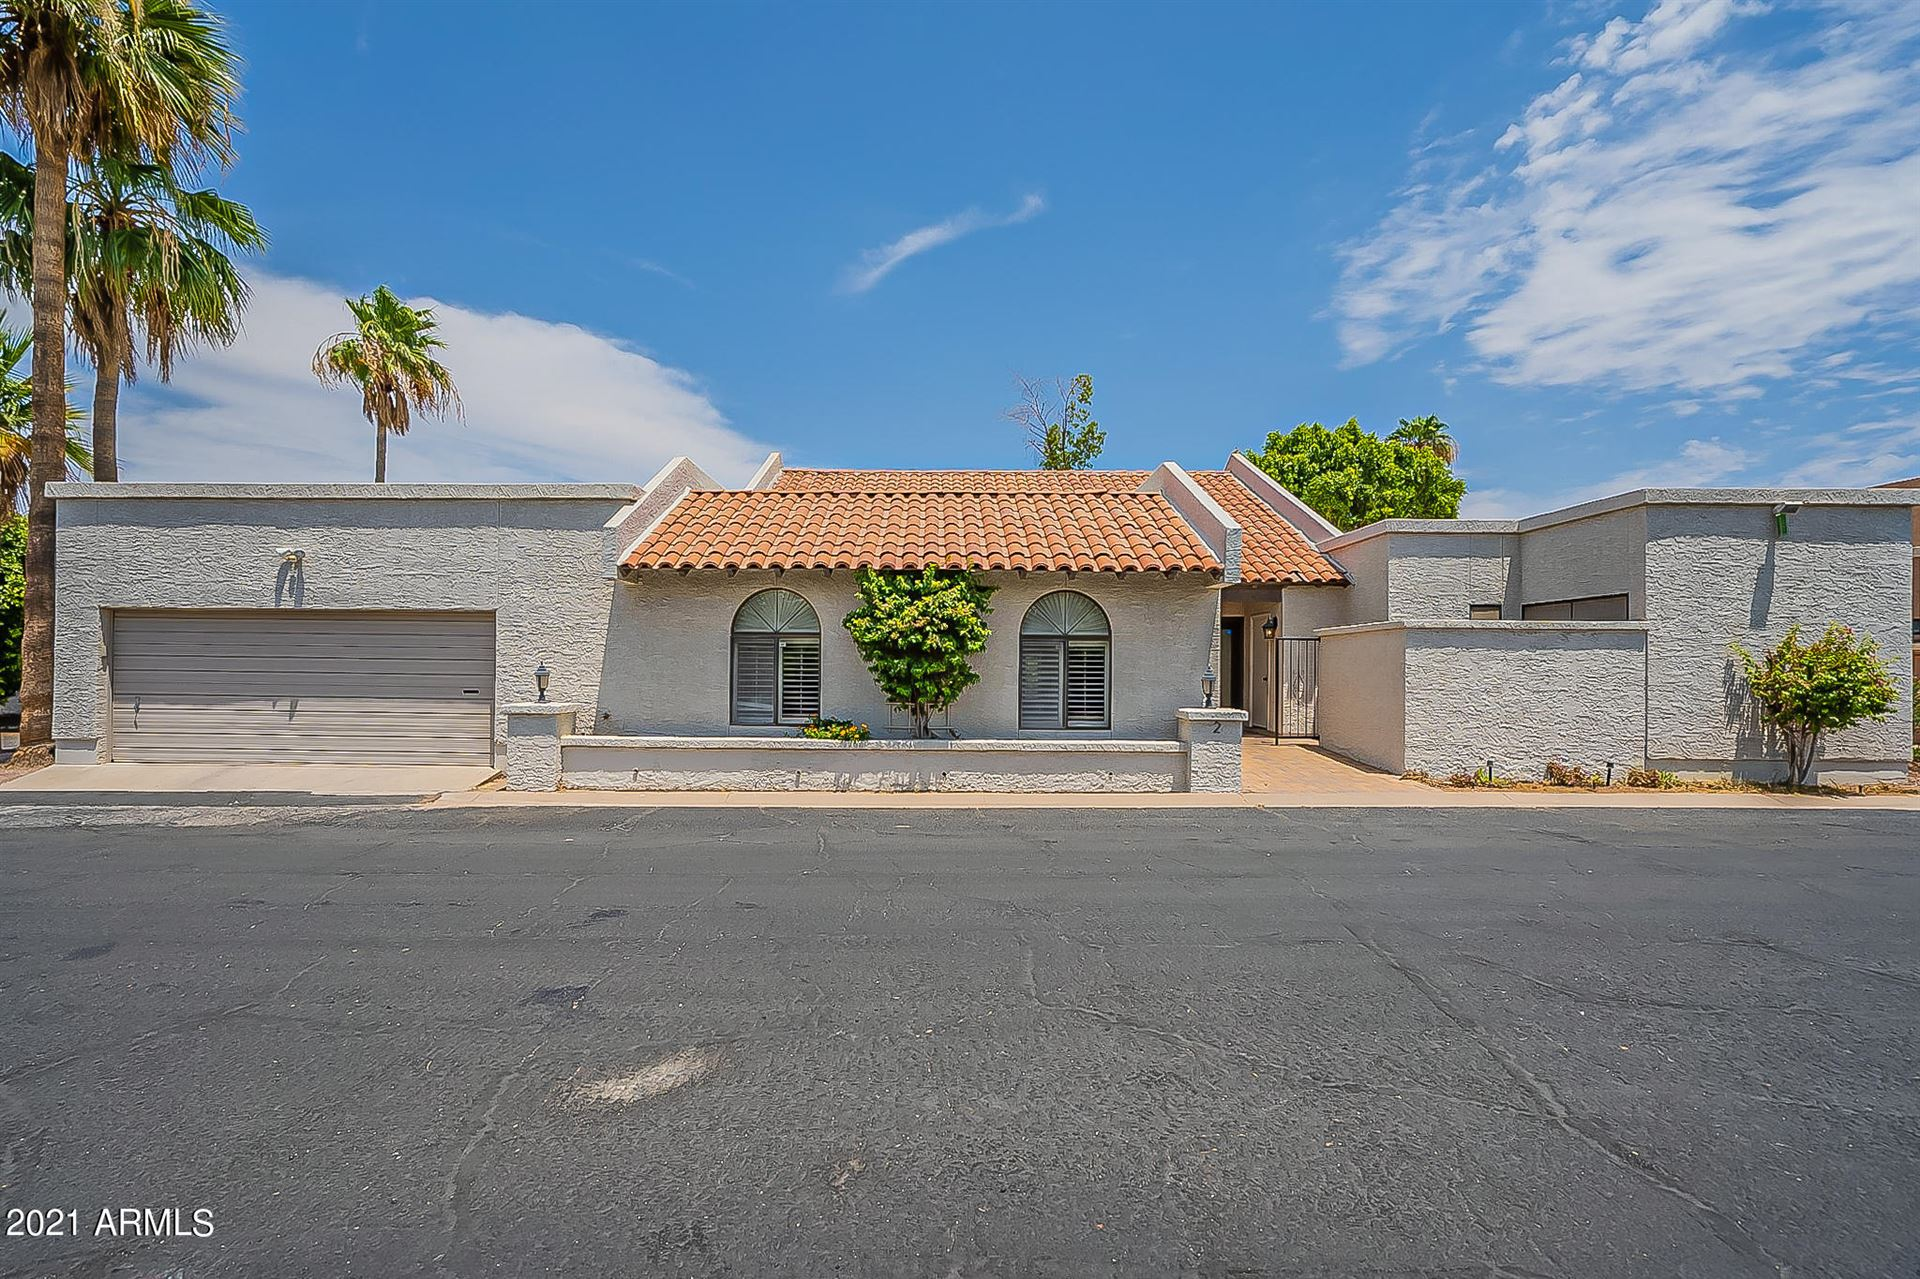 350 W MCLELLAN Road #2, Mesa, AZ 85201 - MLS#: 6254650